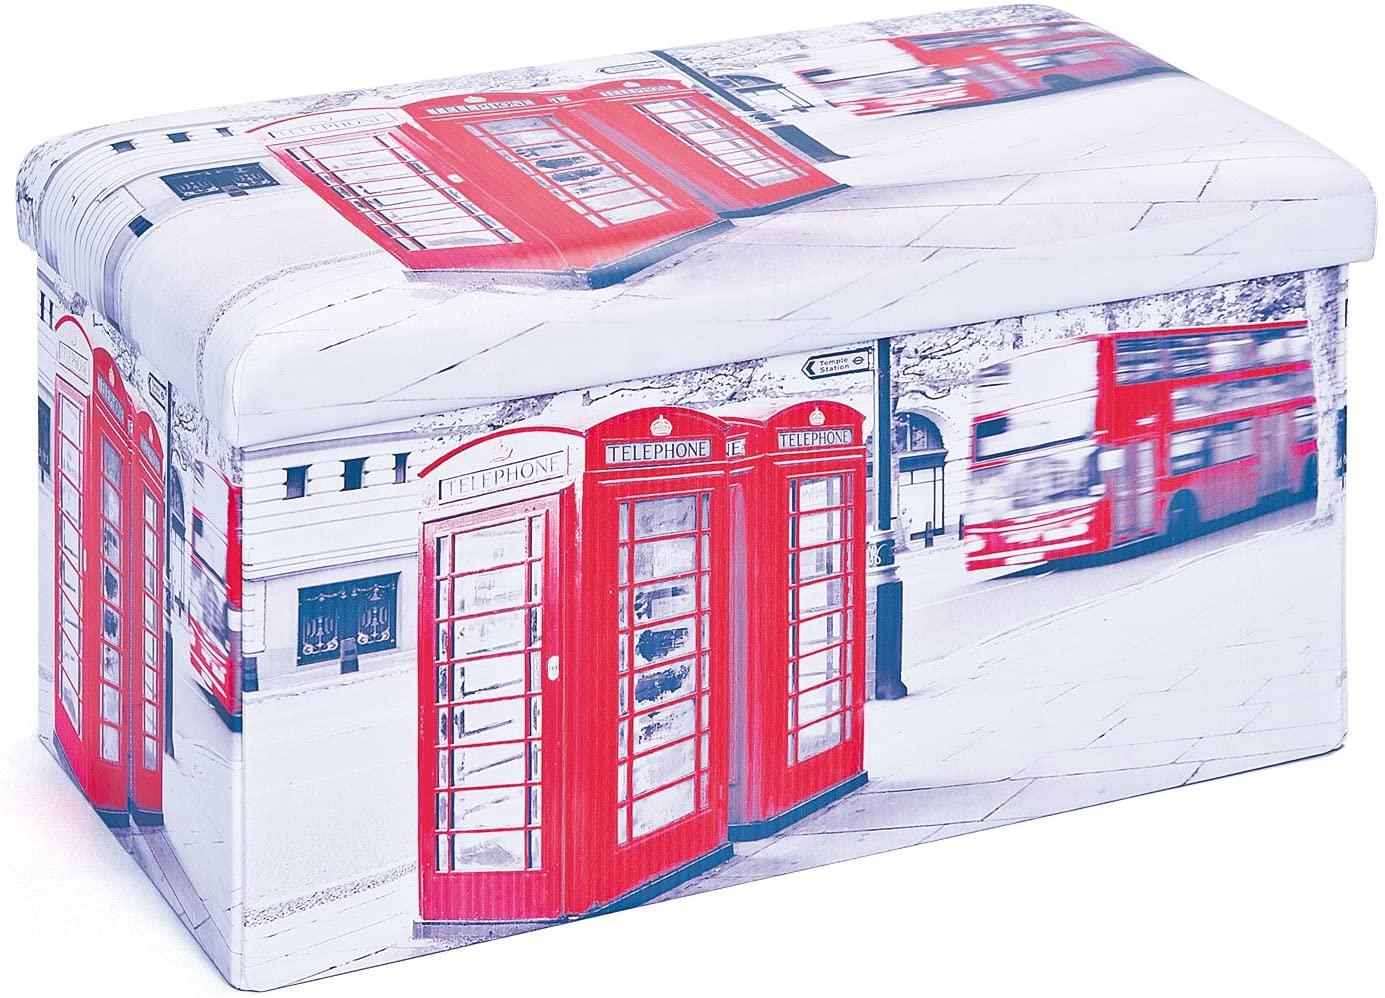 Interlink Spielzeugtruhe 'Setto London' Bild 1